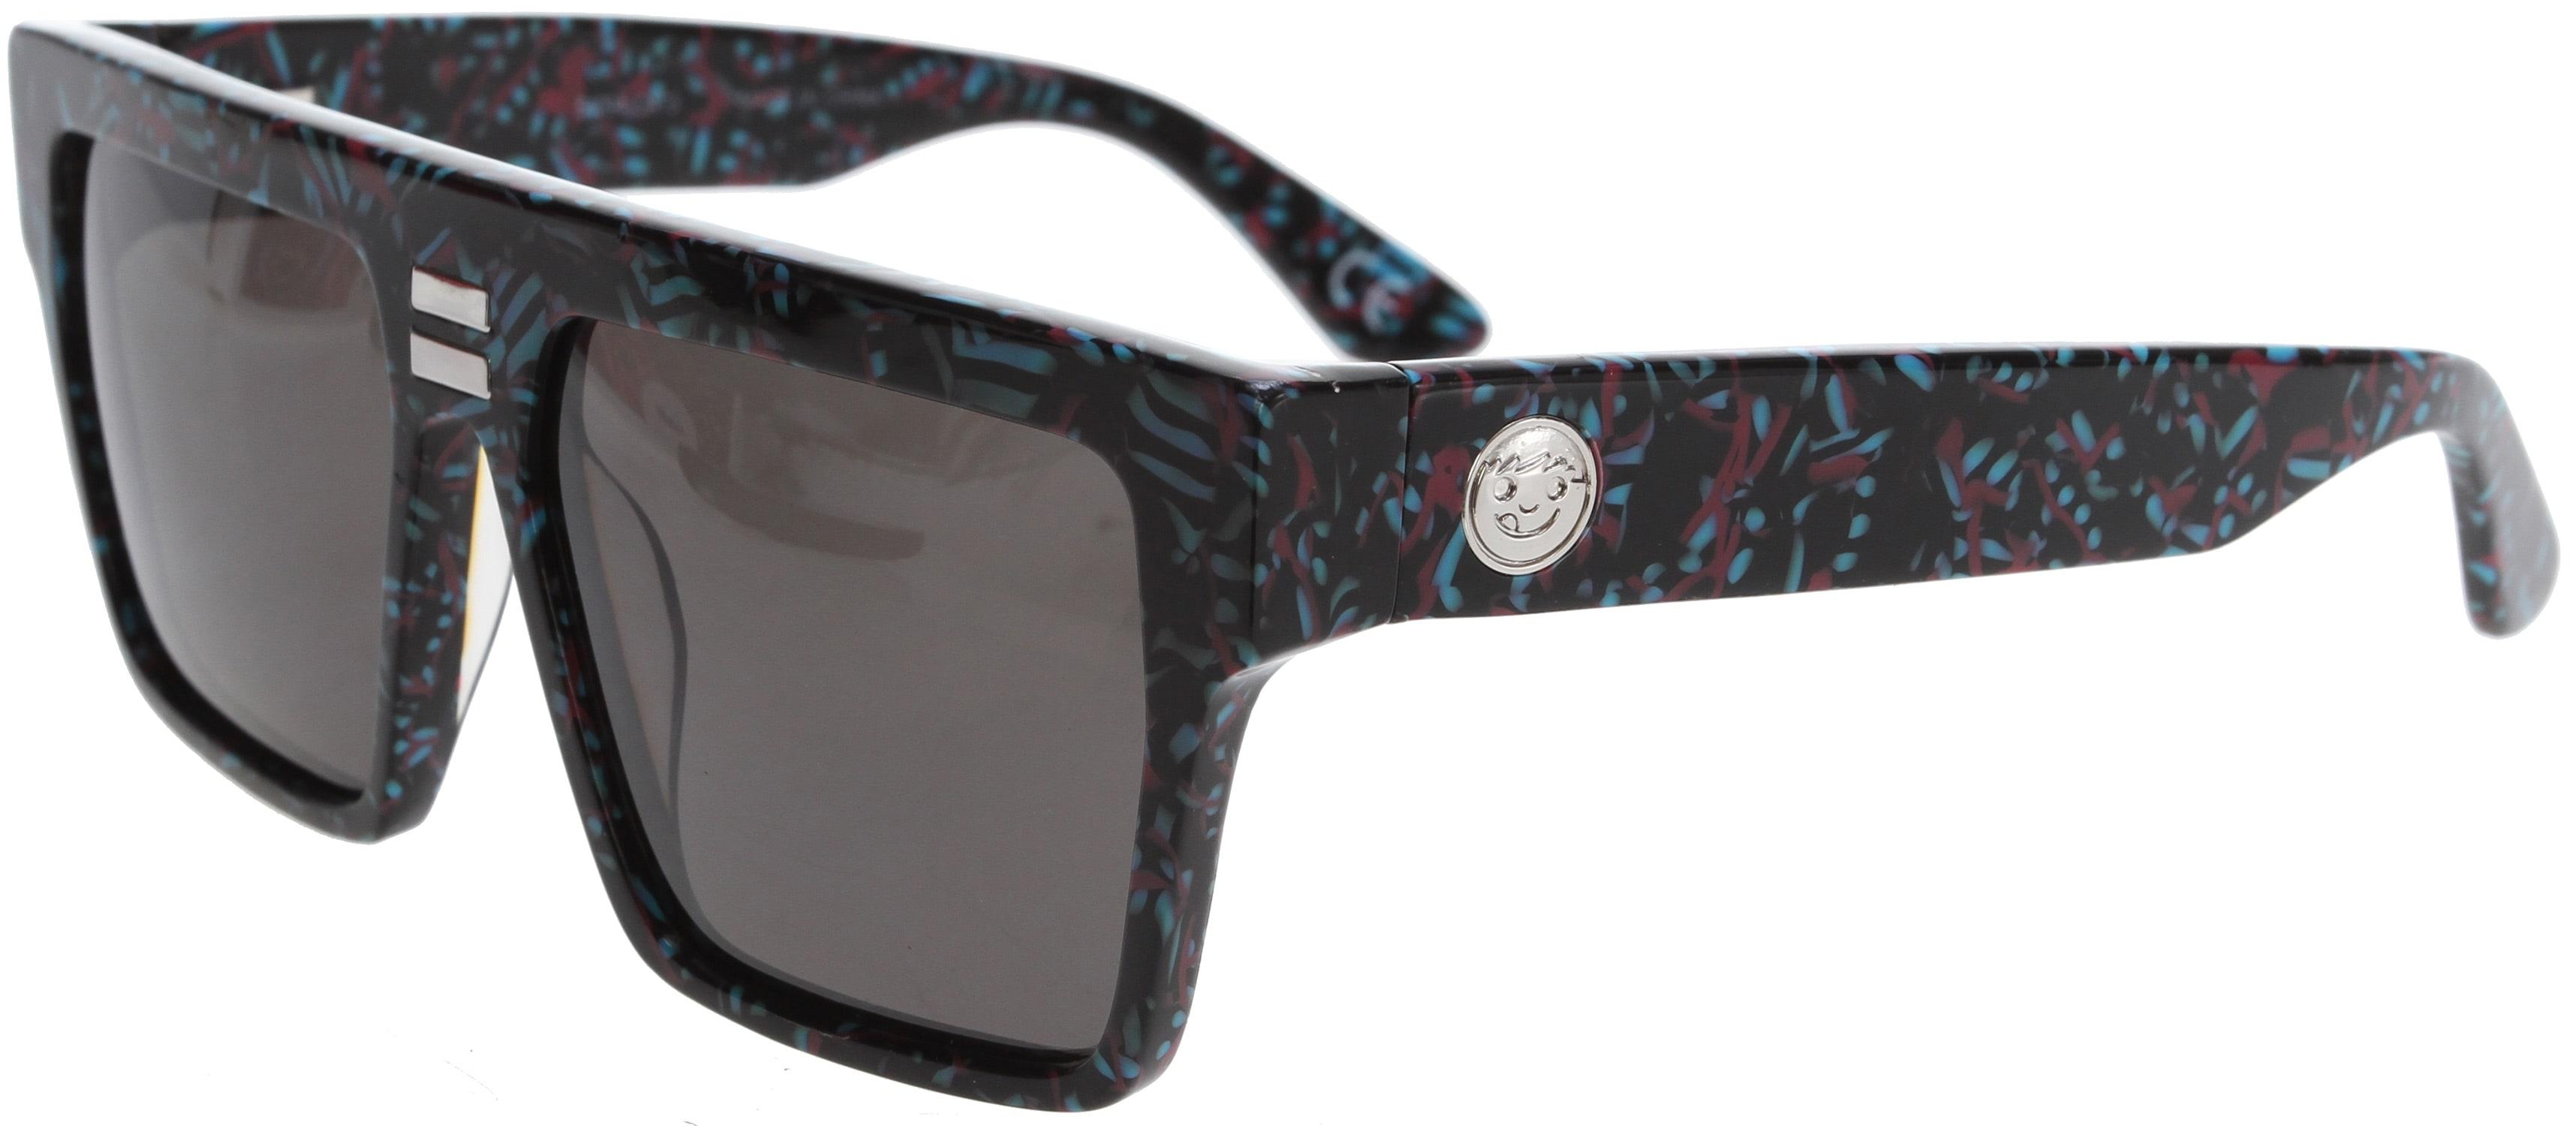 best online sunglasses store  vector sunglasses